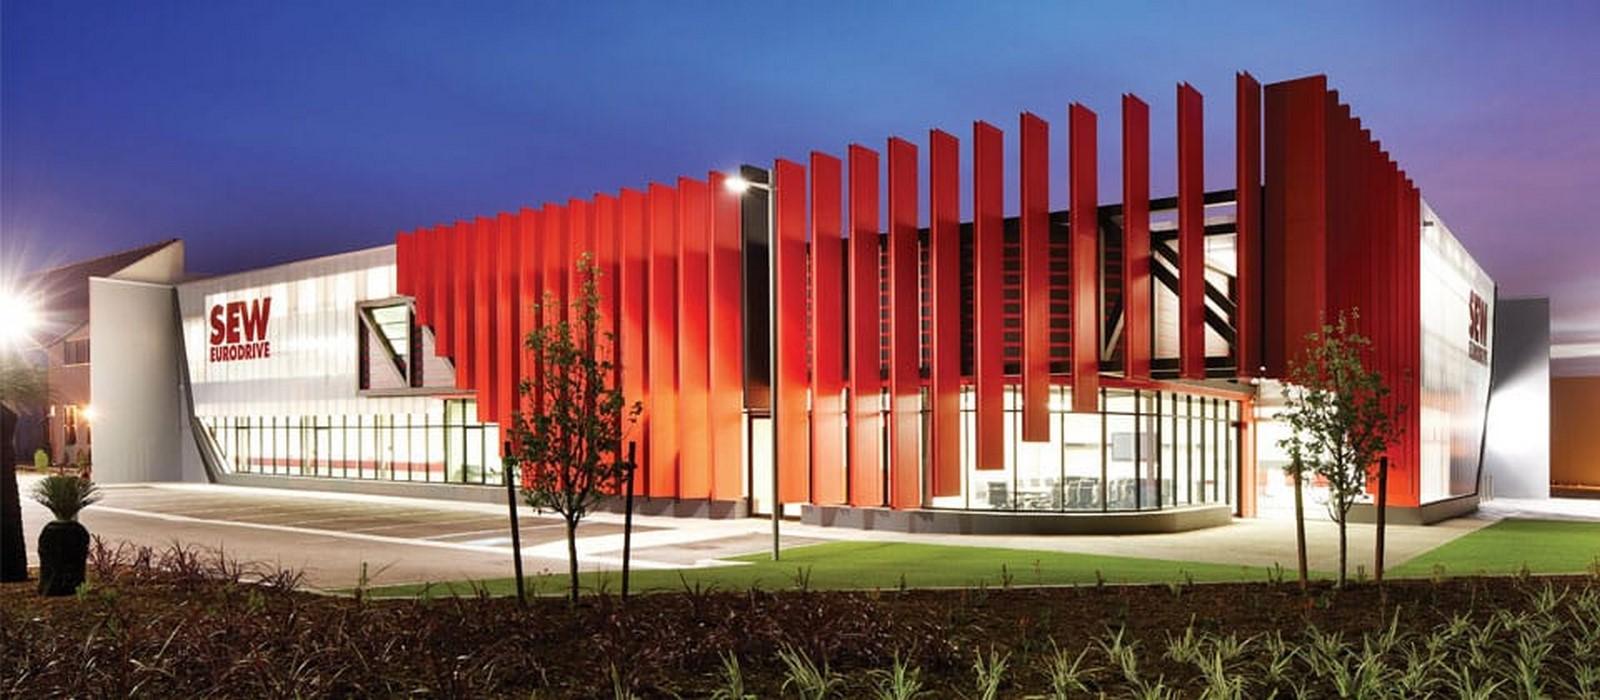 SEW Eurodrive Office and Warehouse, Welshpool, Western Australia - Sheet1